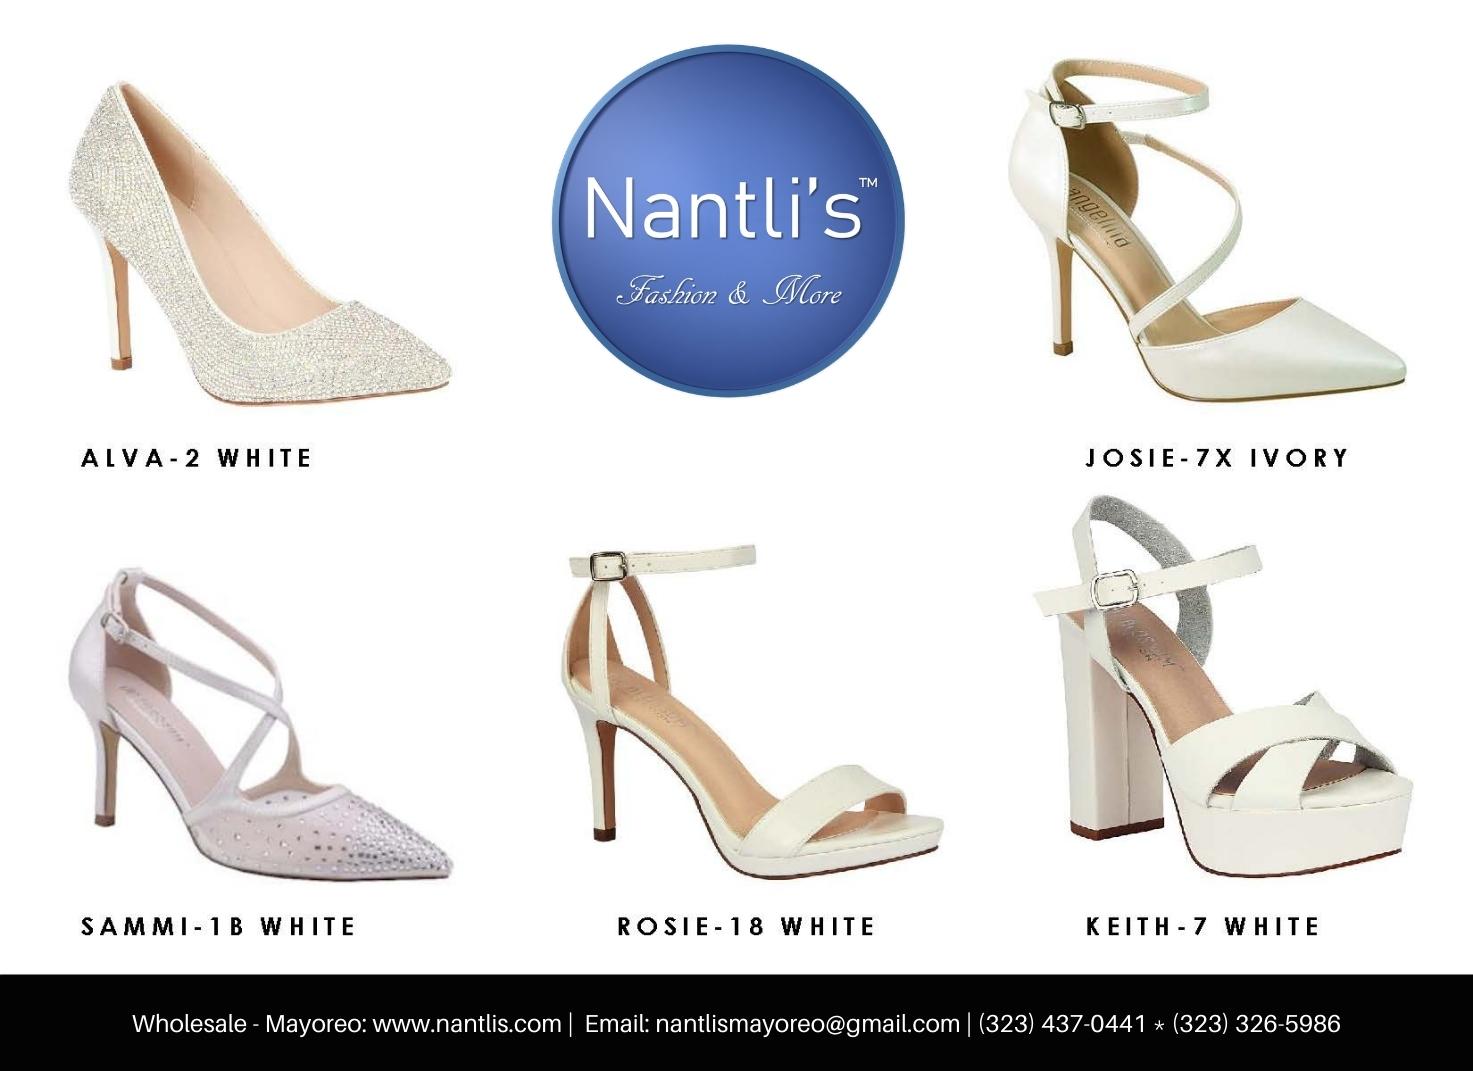 Nantlis Vol WE2 Bodas y Fiestas - Weddings and Parties Page-05